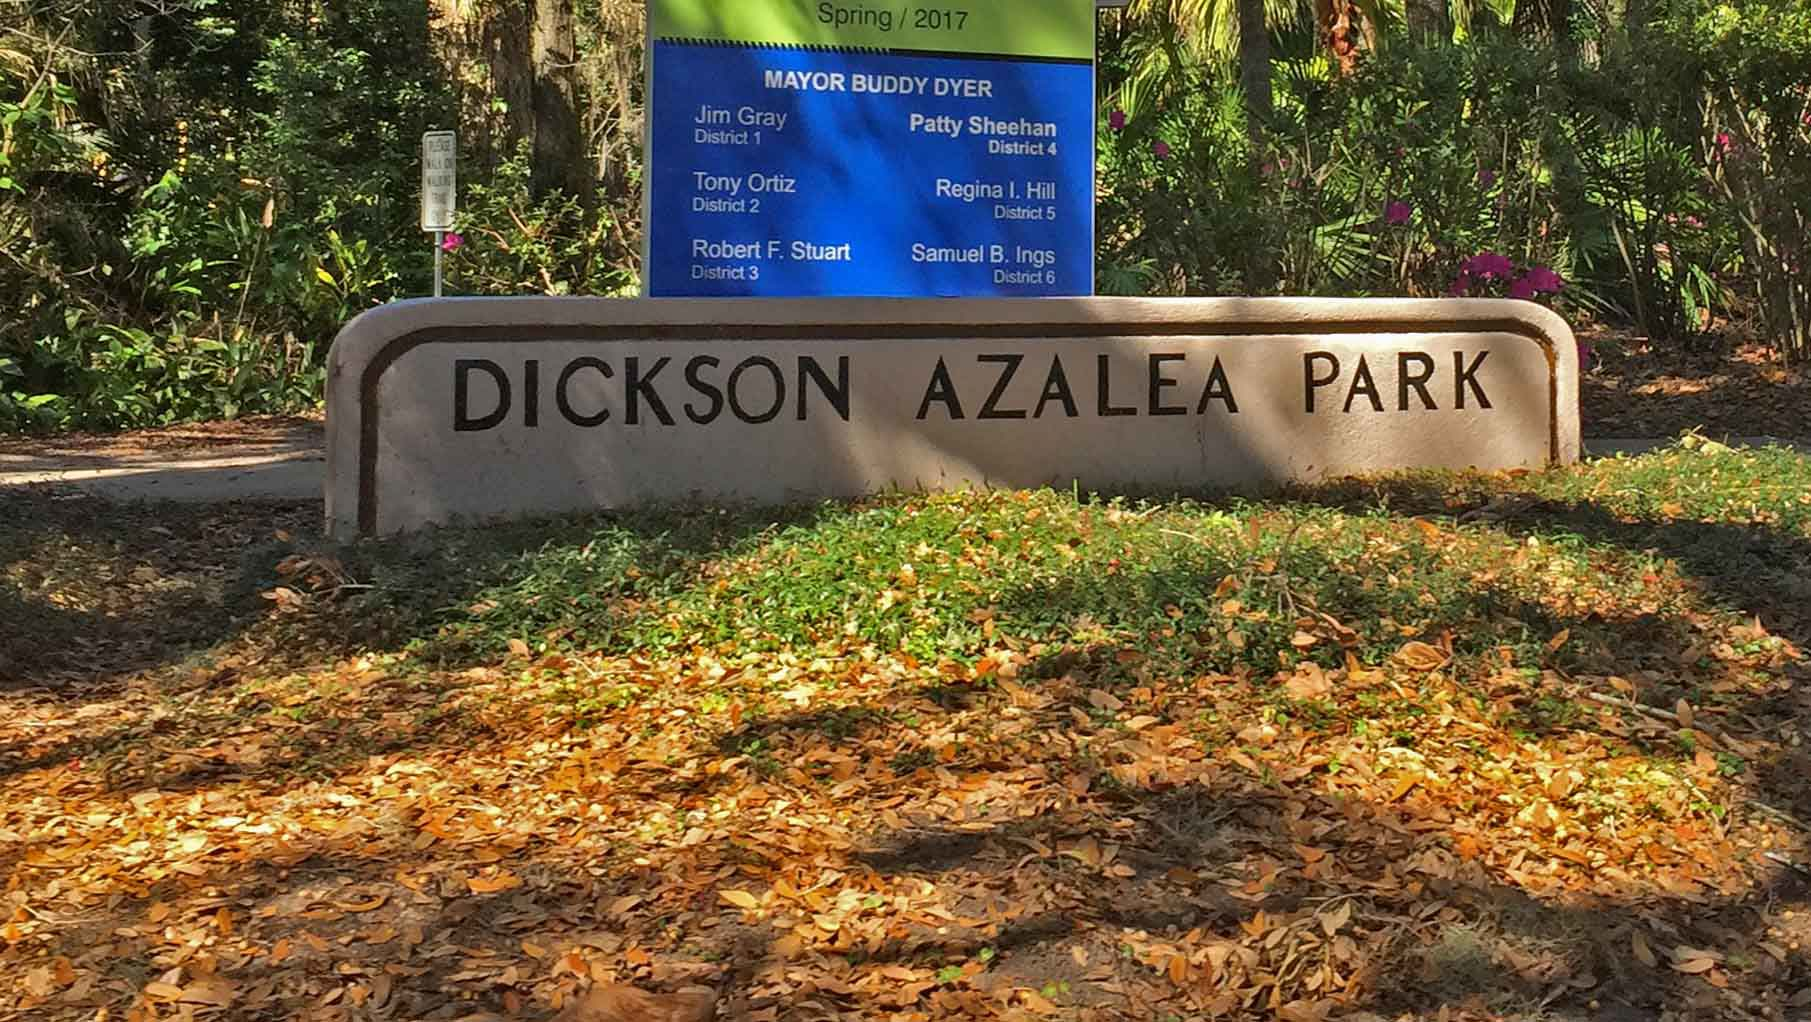 Dickson Azalea Park